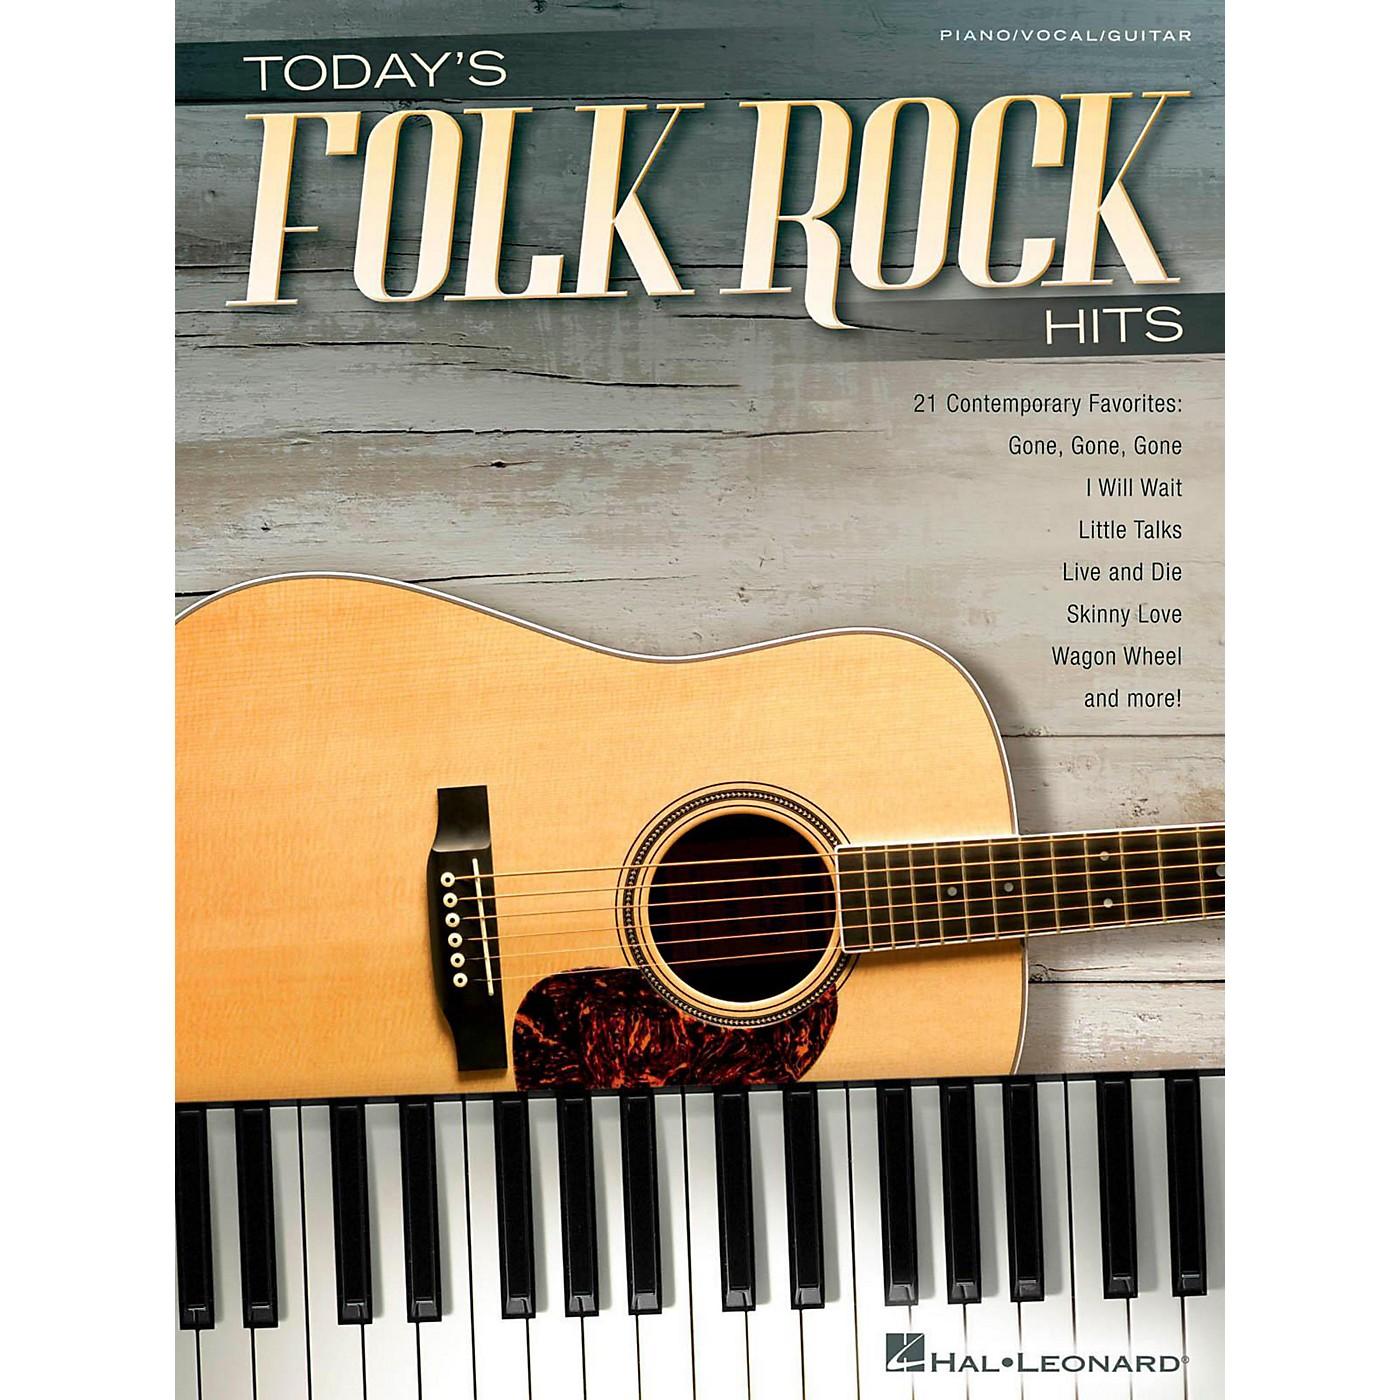 Hal Leonard Today's Folk Rock Hits Piano/Vocal/Guitar Songbook thumbnail